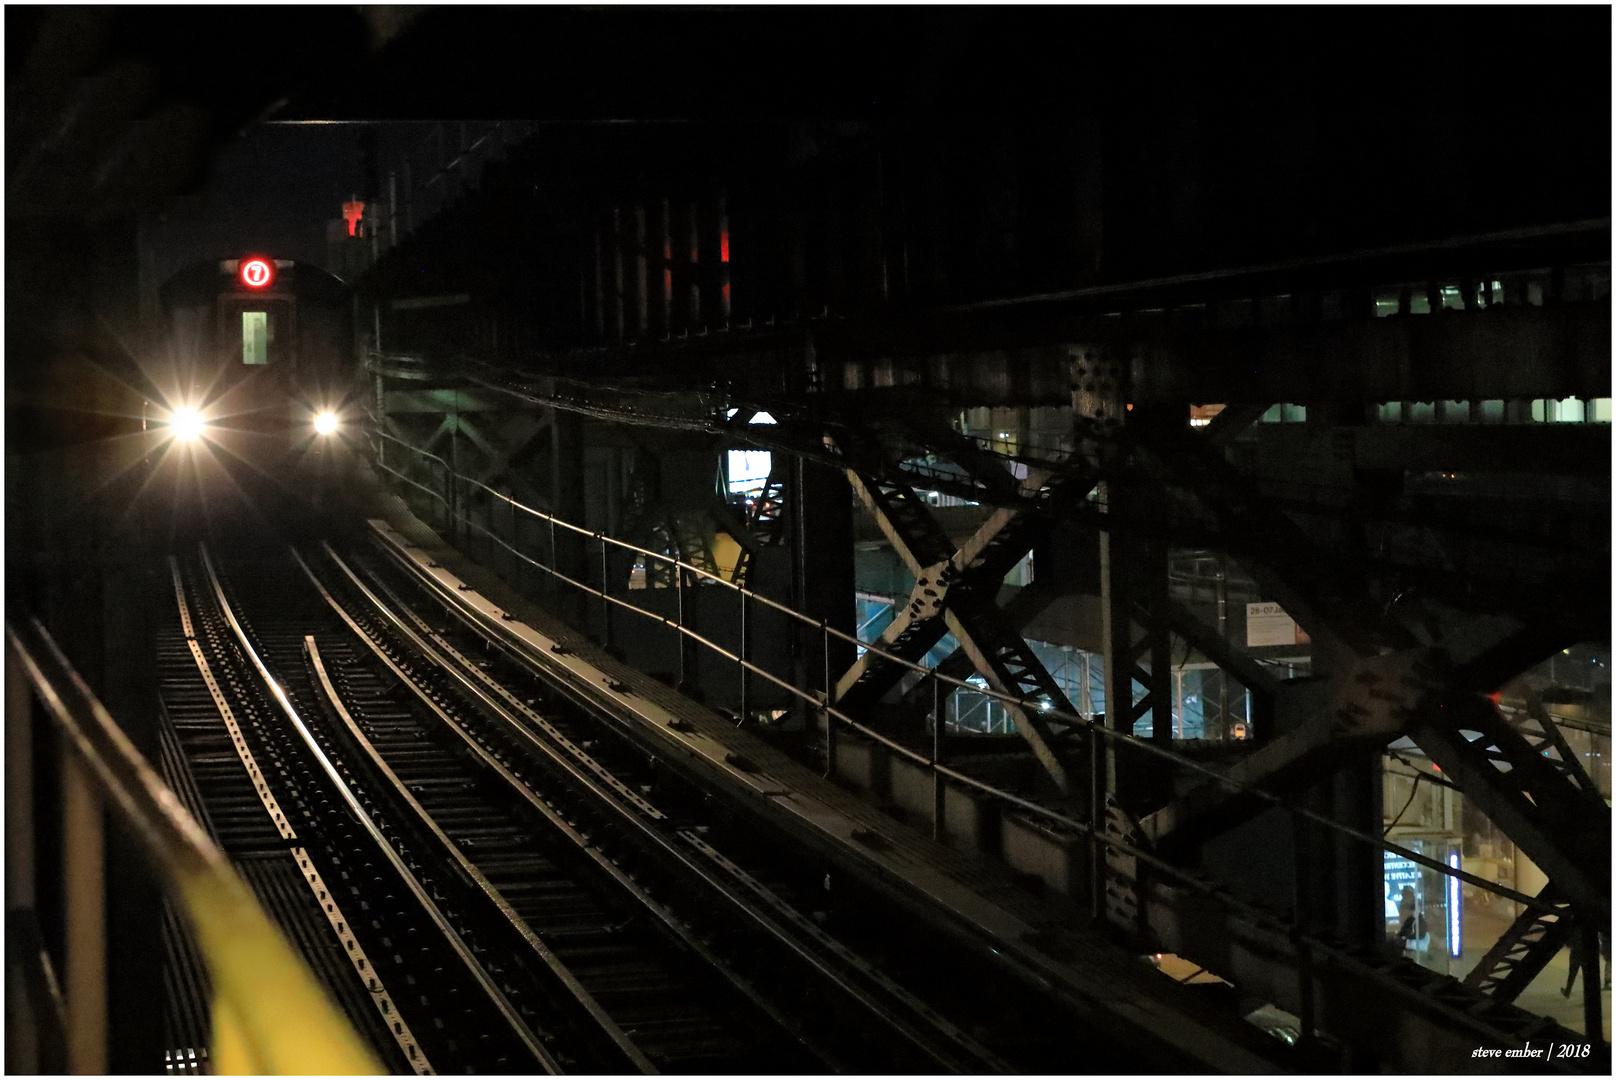 Night Trains No.7 – Manhattan-bound 7 Train enters Queensboro Plaza